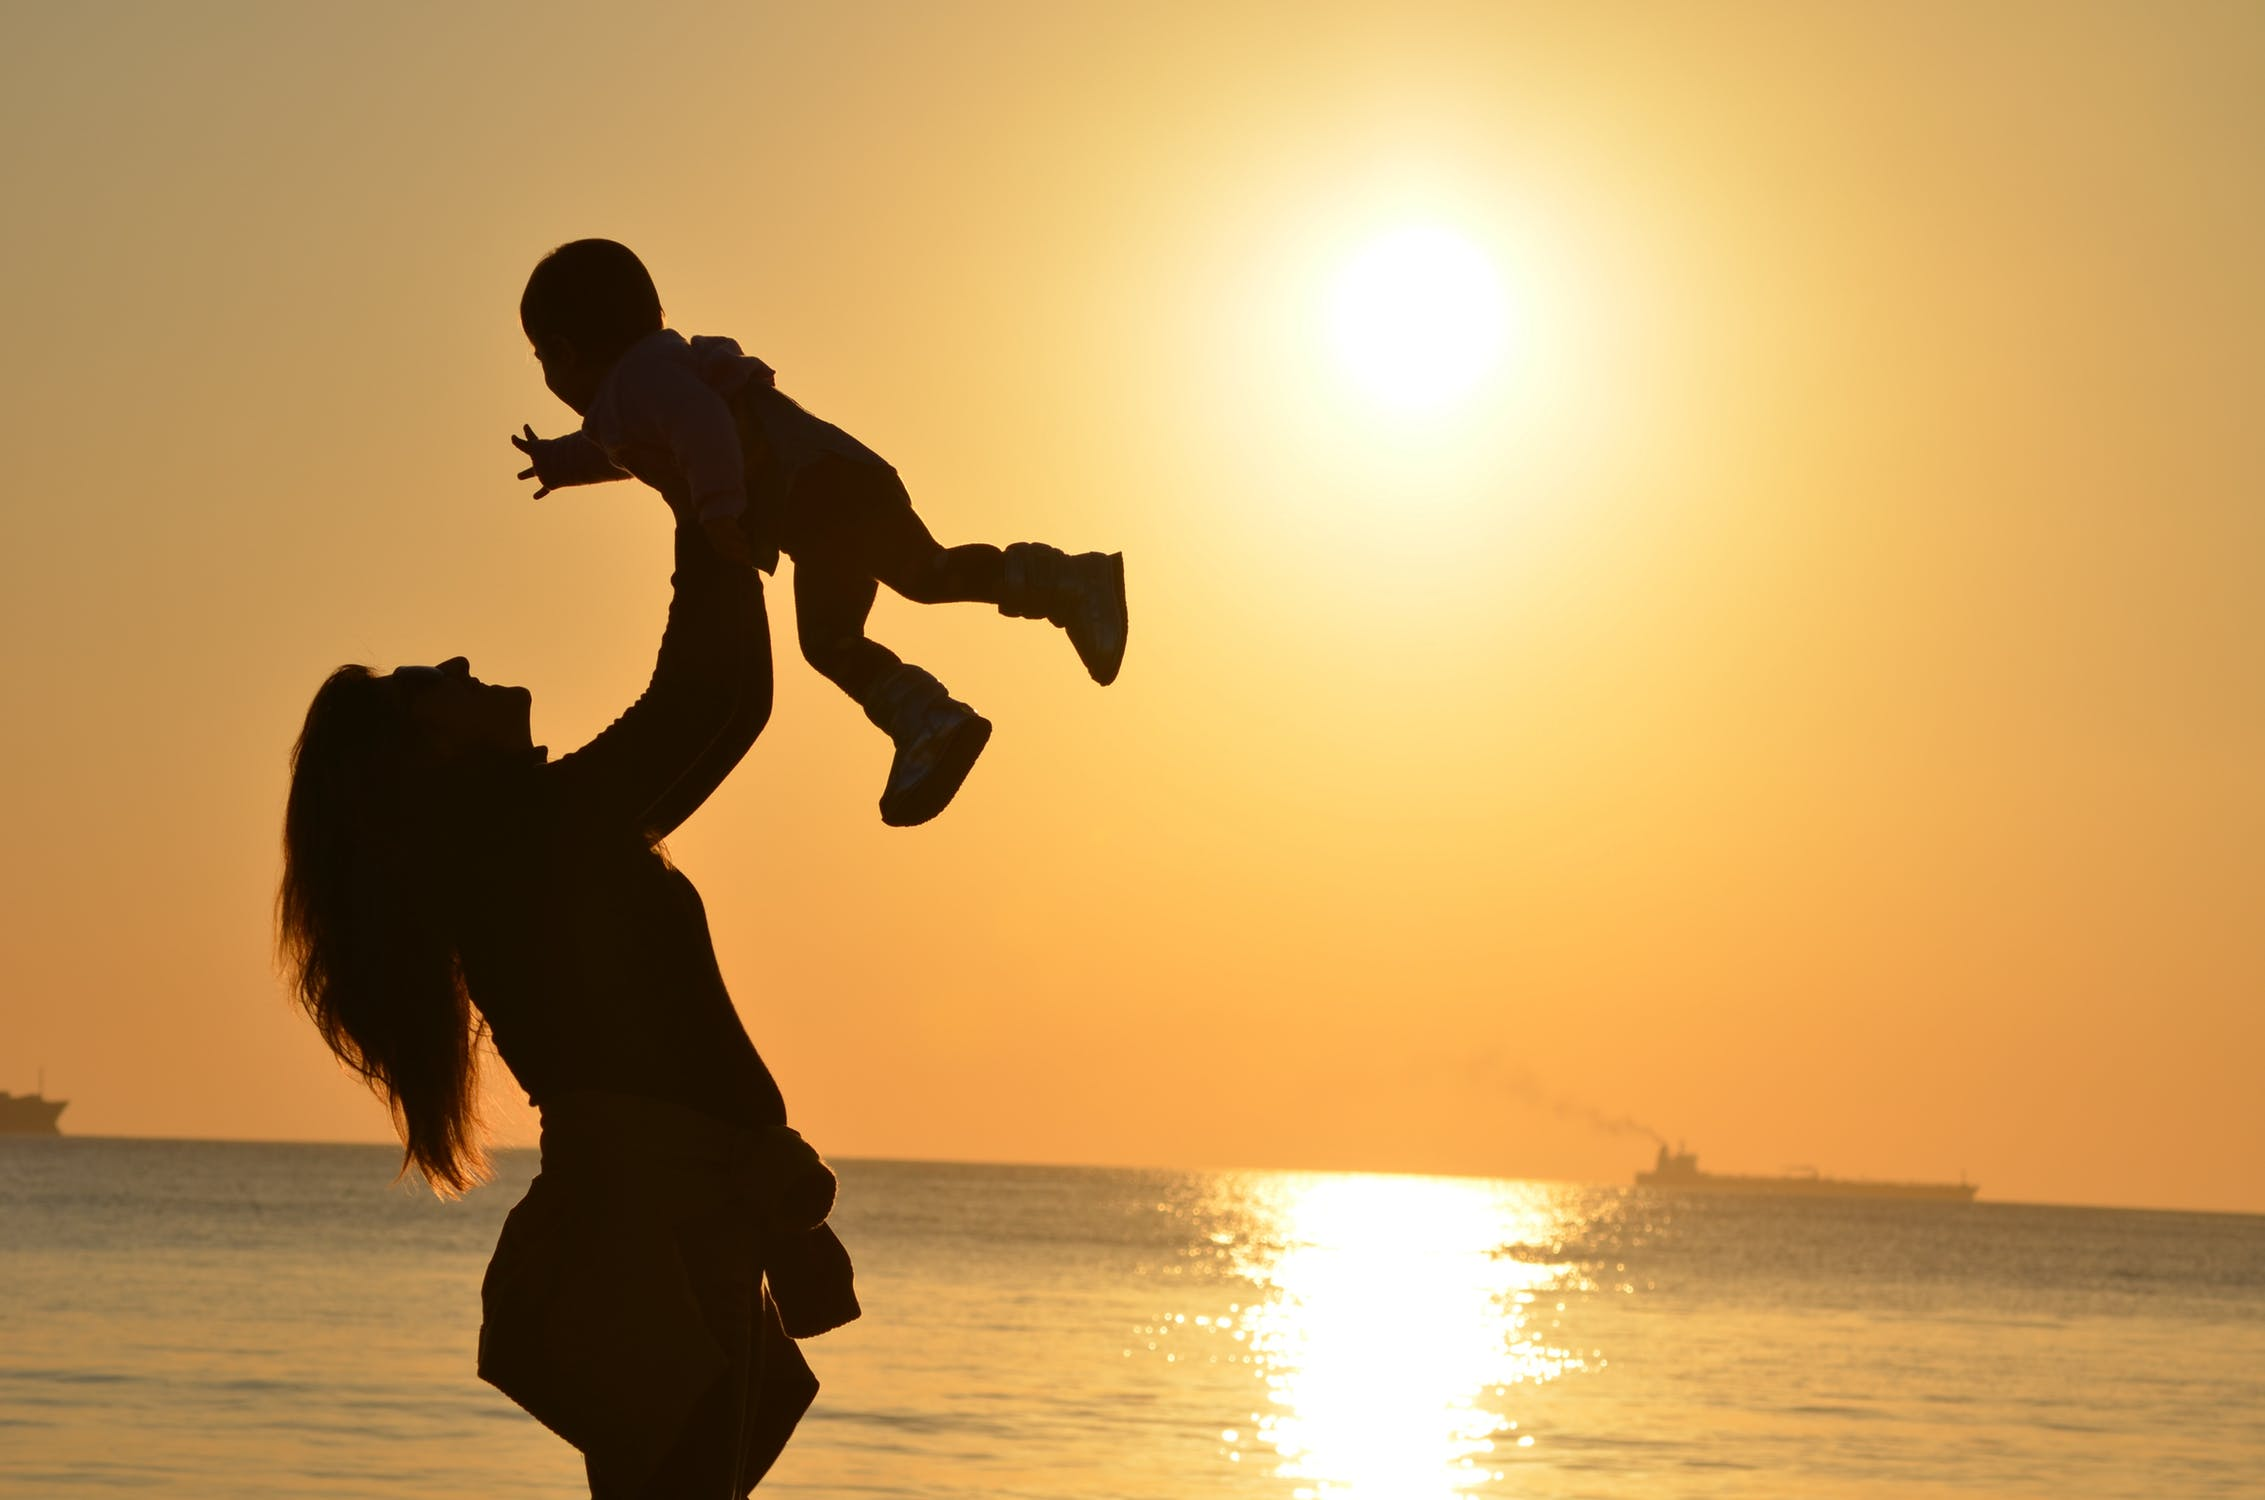 'Mother' An Earlier Heaven